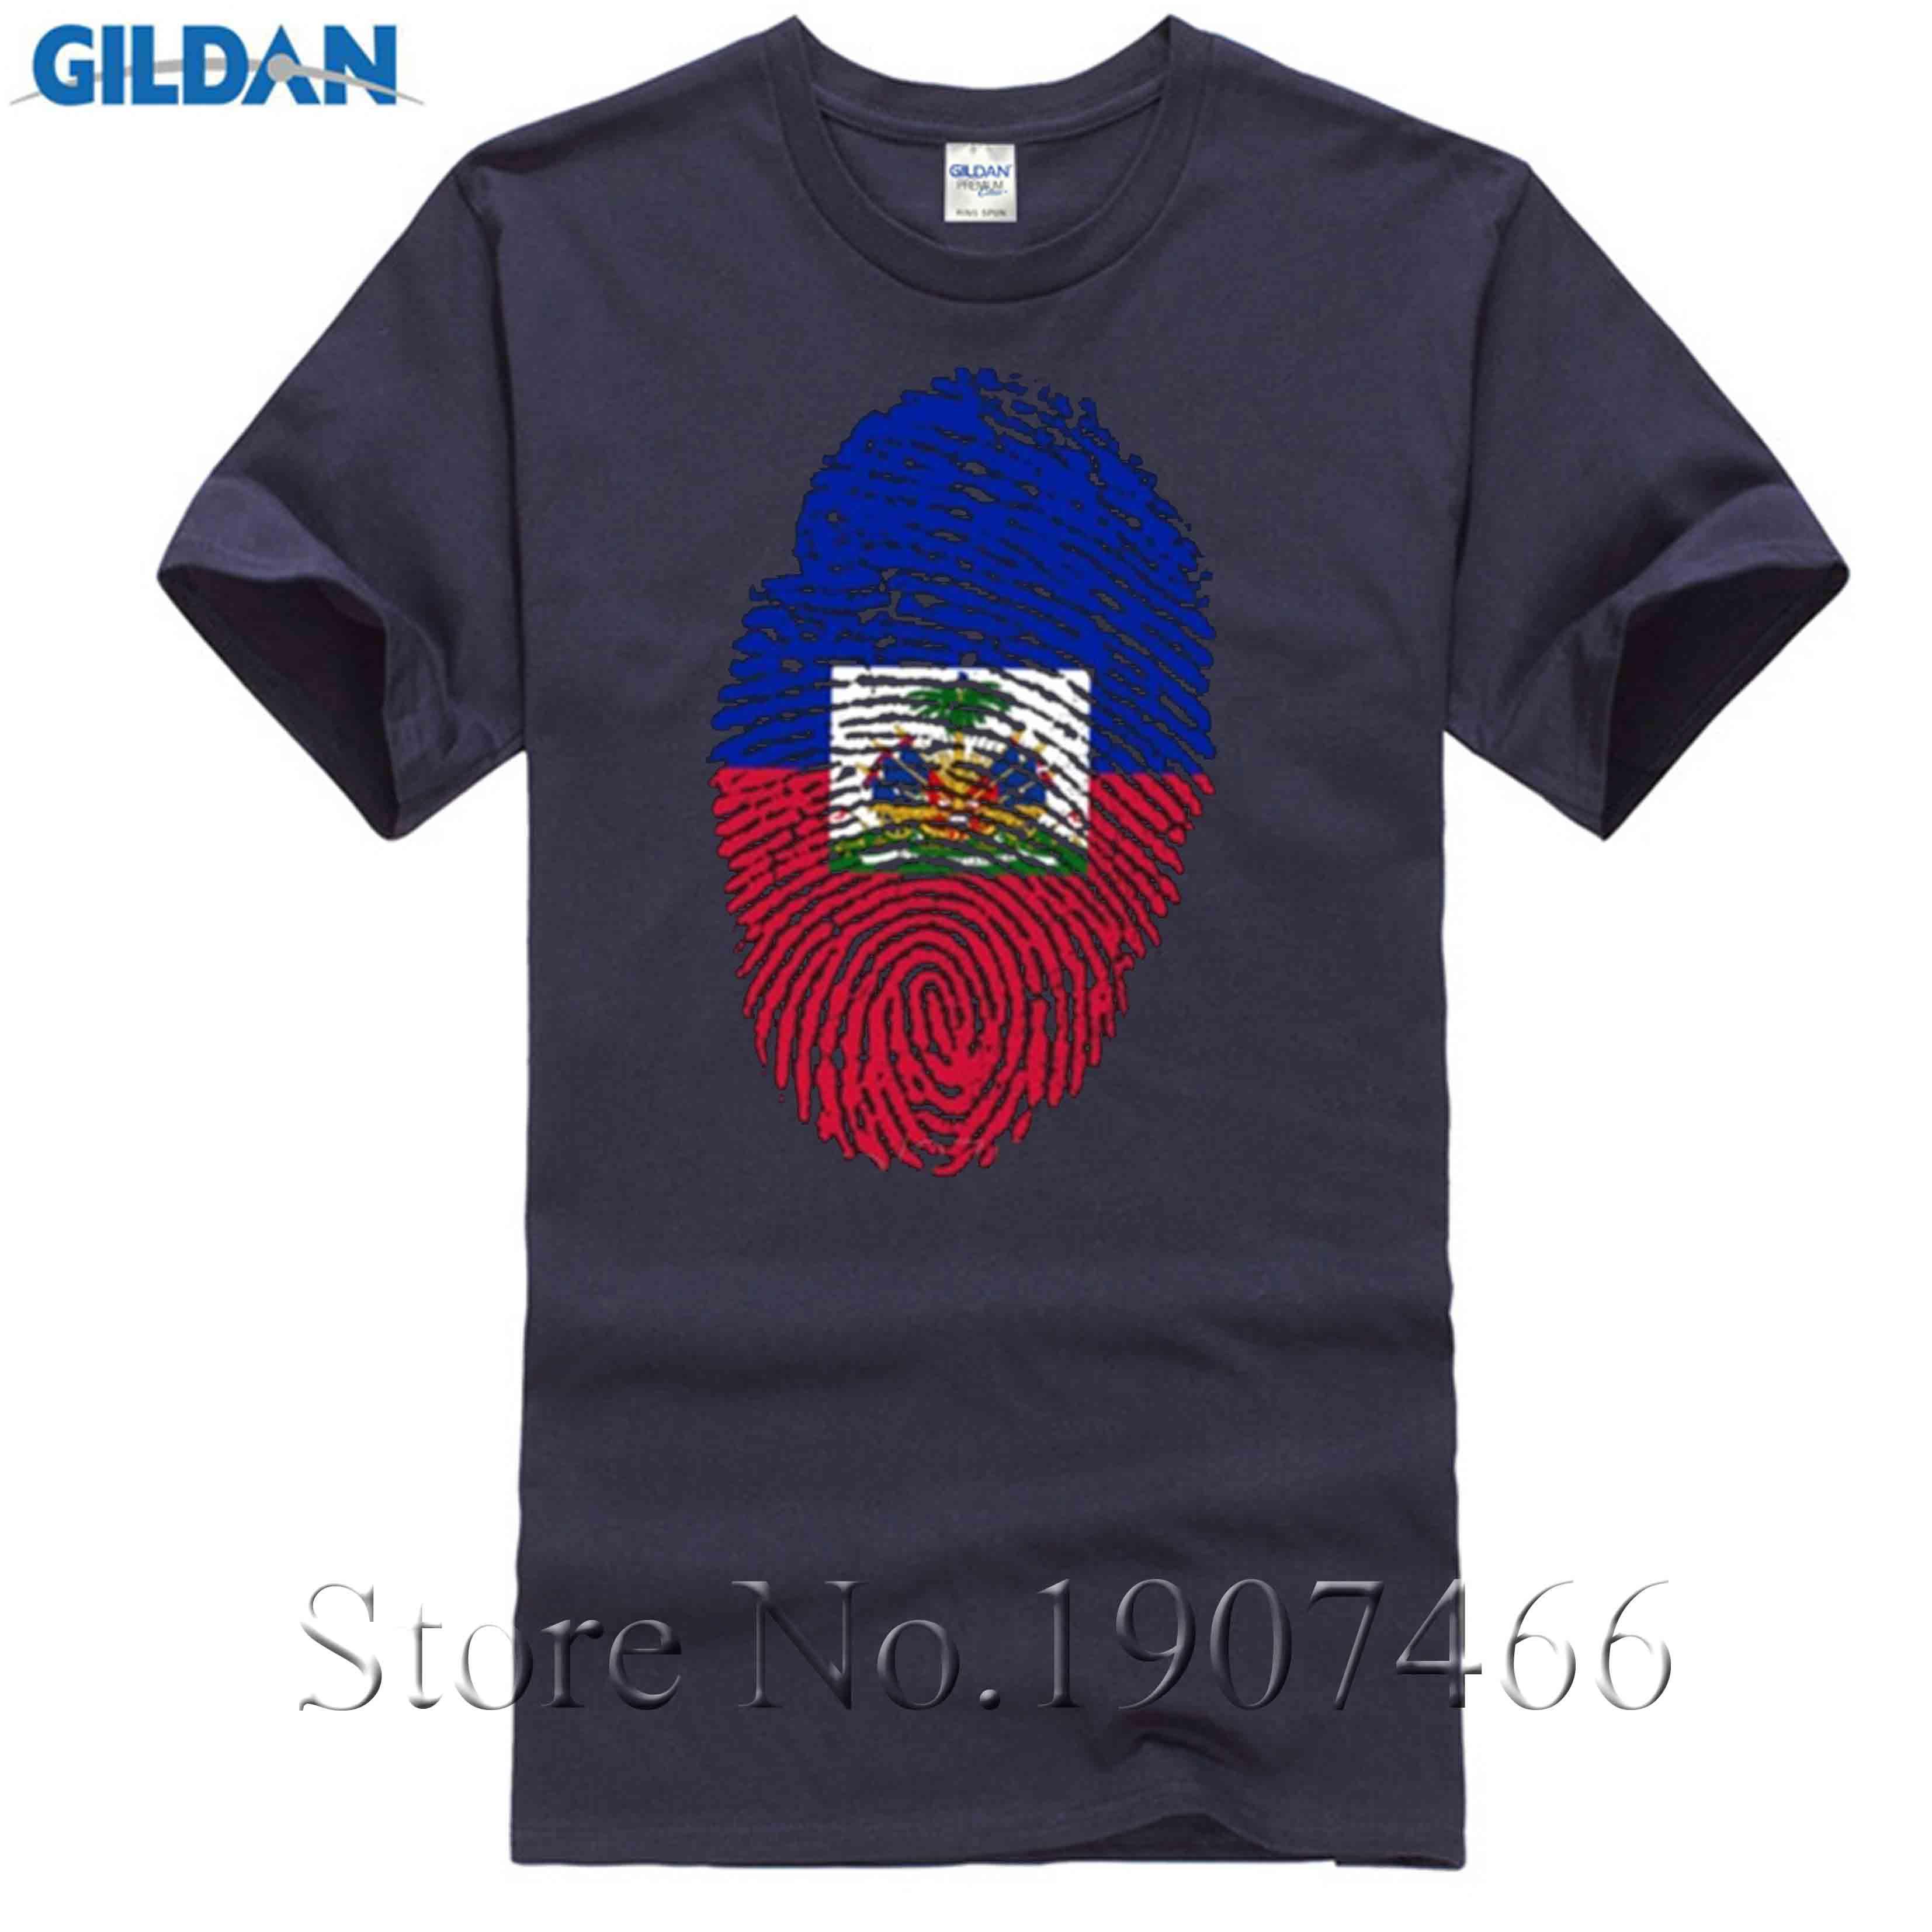 Men's Clothing Tops & Tees T Shirt Mens 3d Big Size Haiti Flag Fingerprint Wholesale Custom Work Tshirts Natural Cotton Short Sleeve Male Tees T-shirt